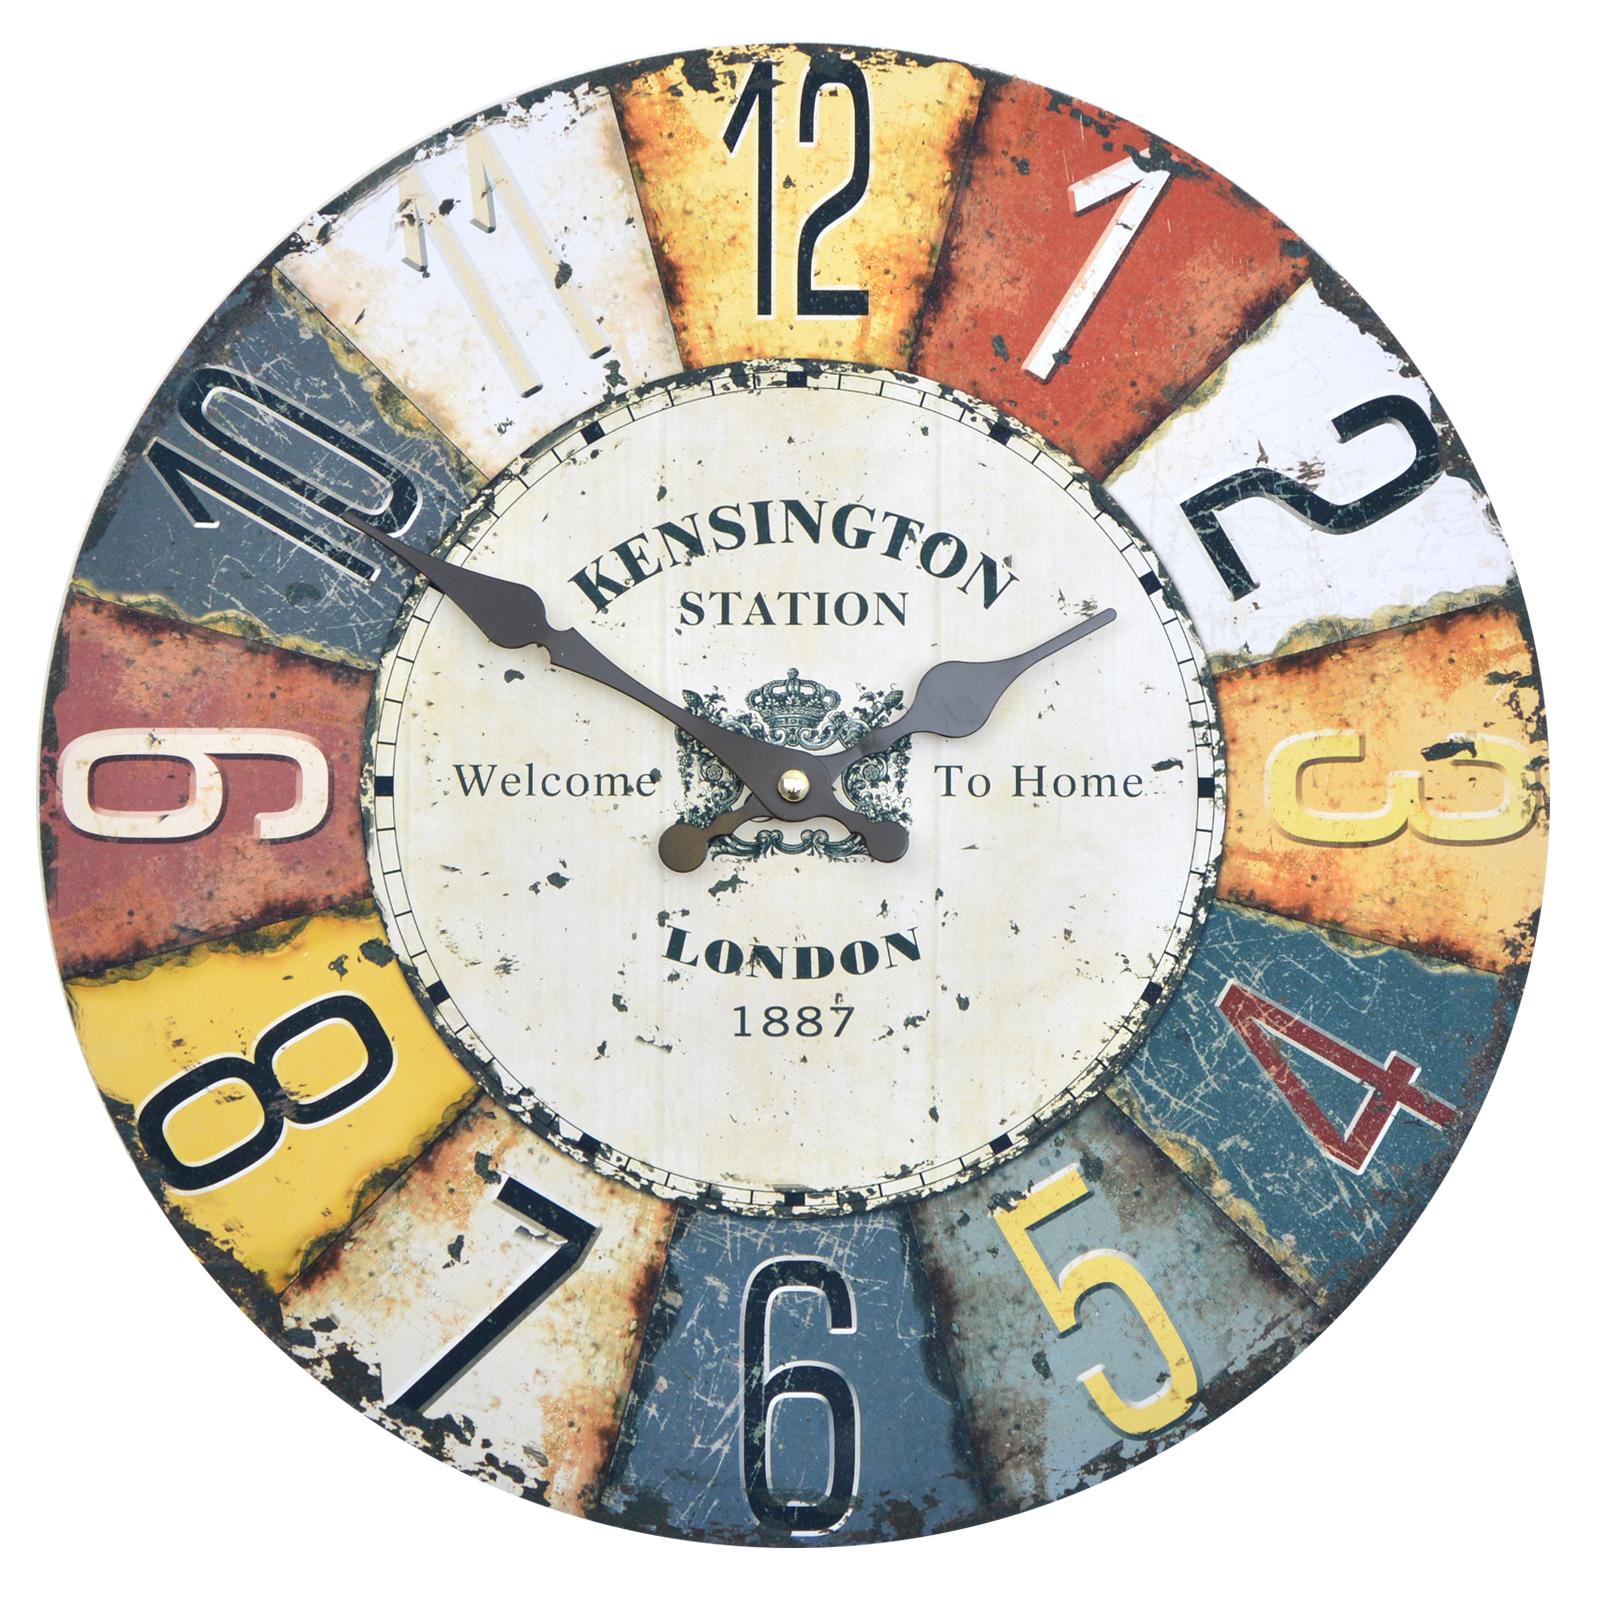 Wanduhr Kensington - bunt - farbenfrohe Uhr im retro Design